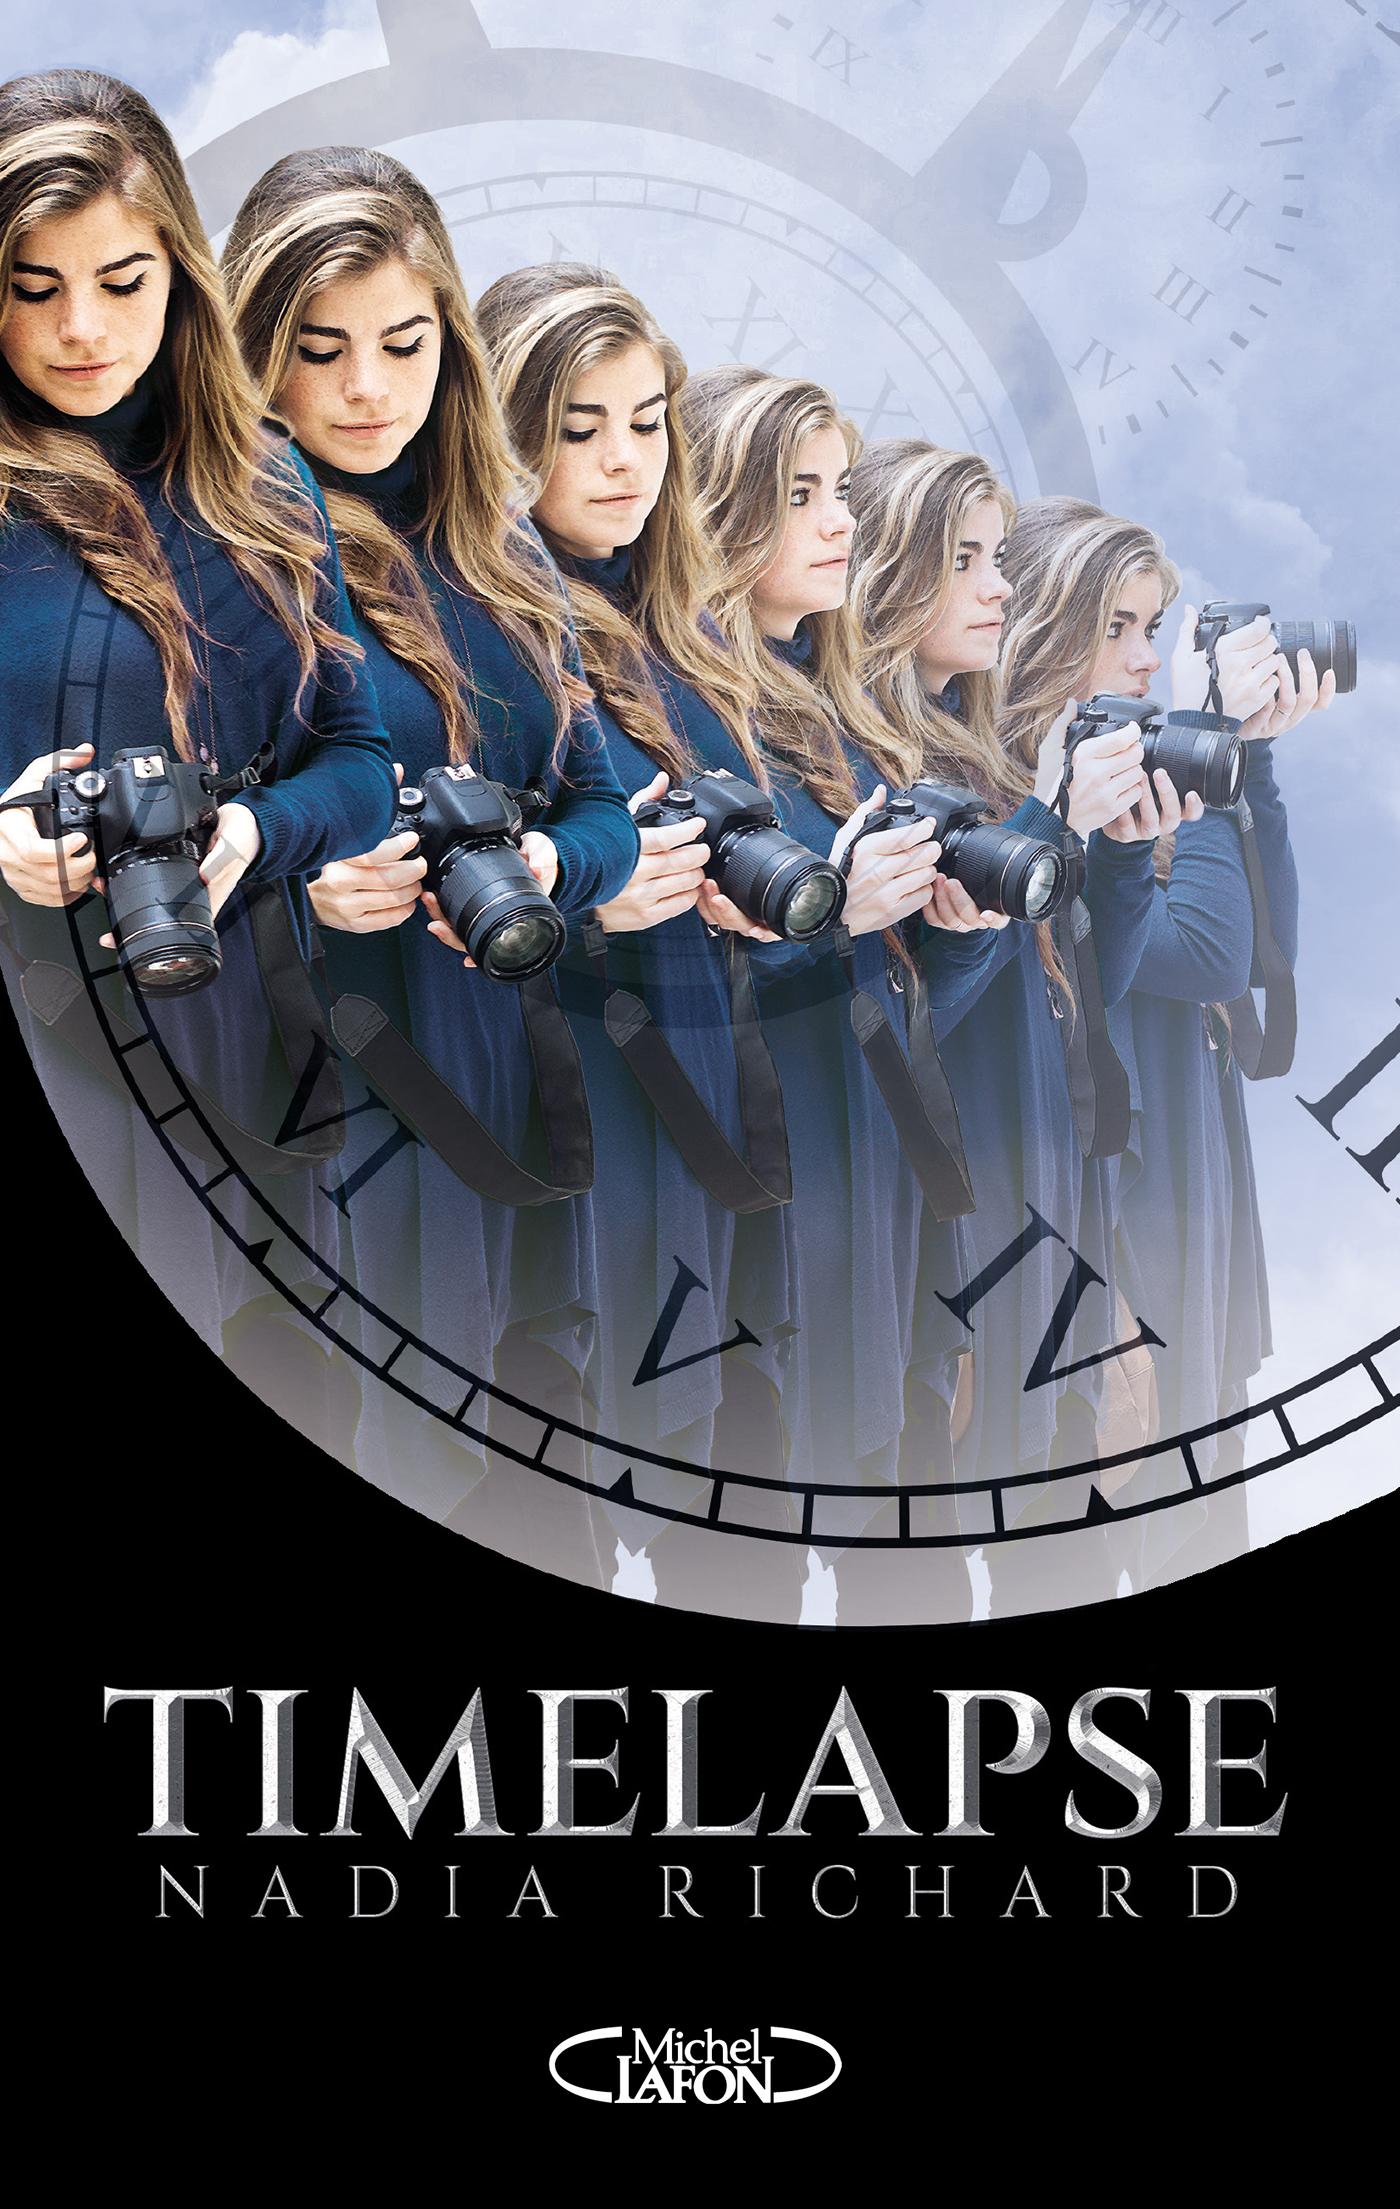 TIMELAPSE